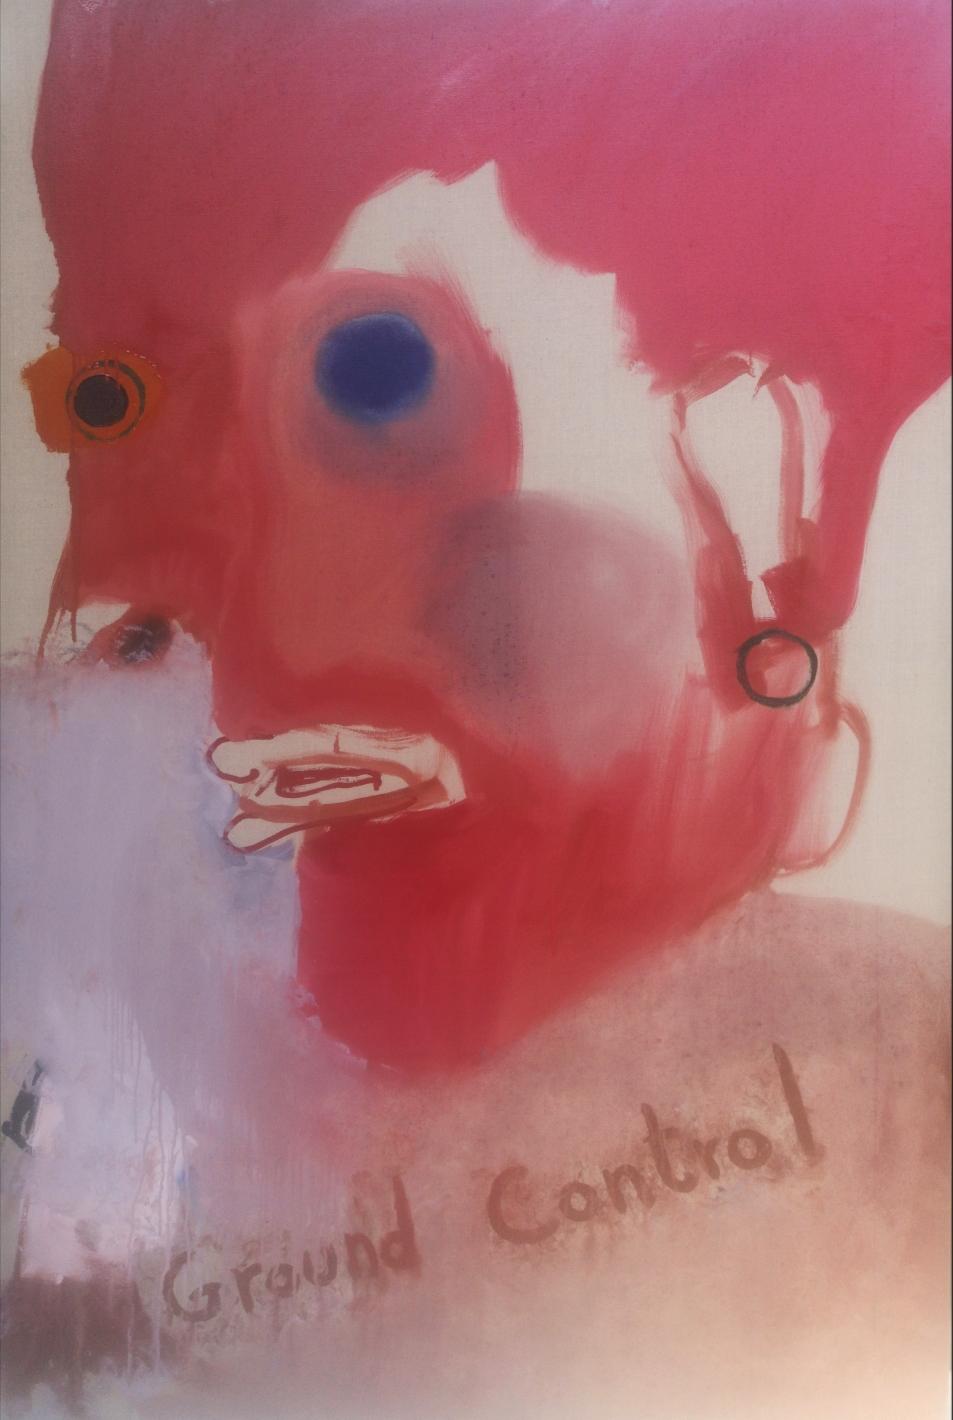 'Ground Control' - Oil on linen canvas - 150x100cm - 2021